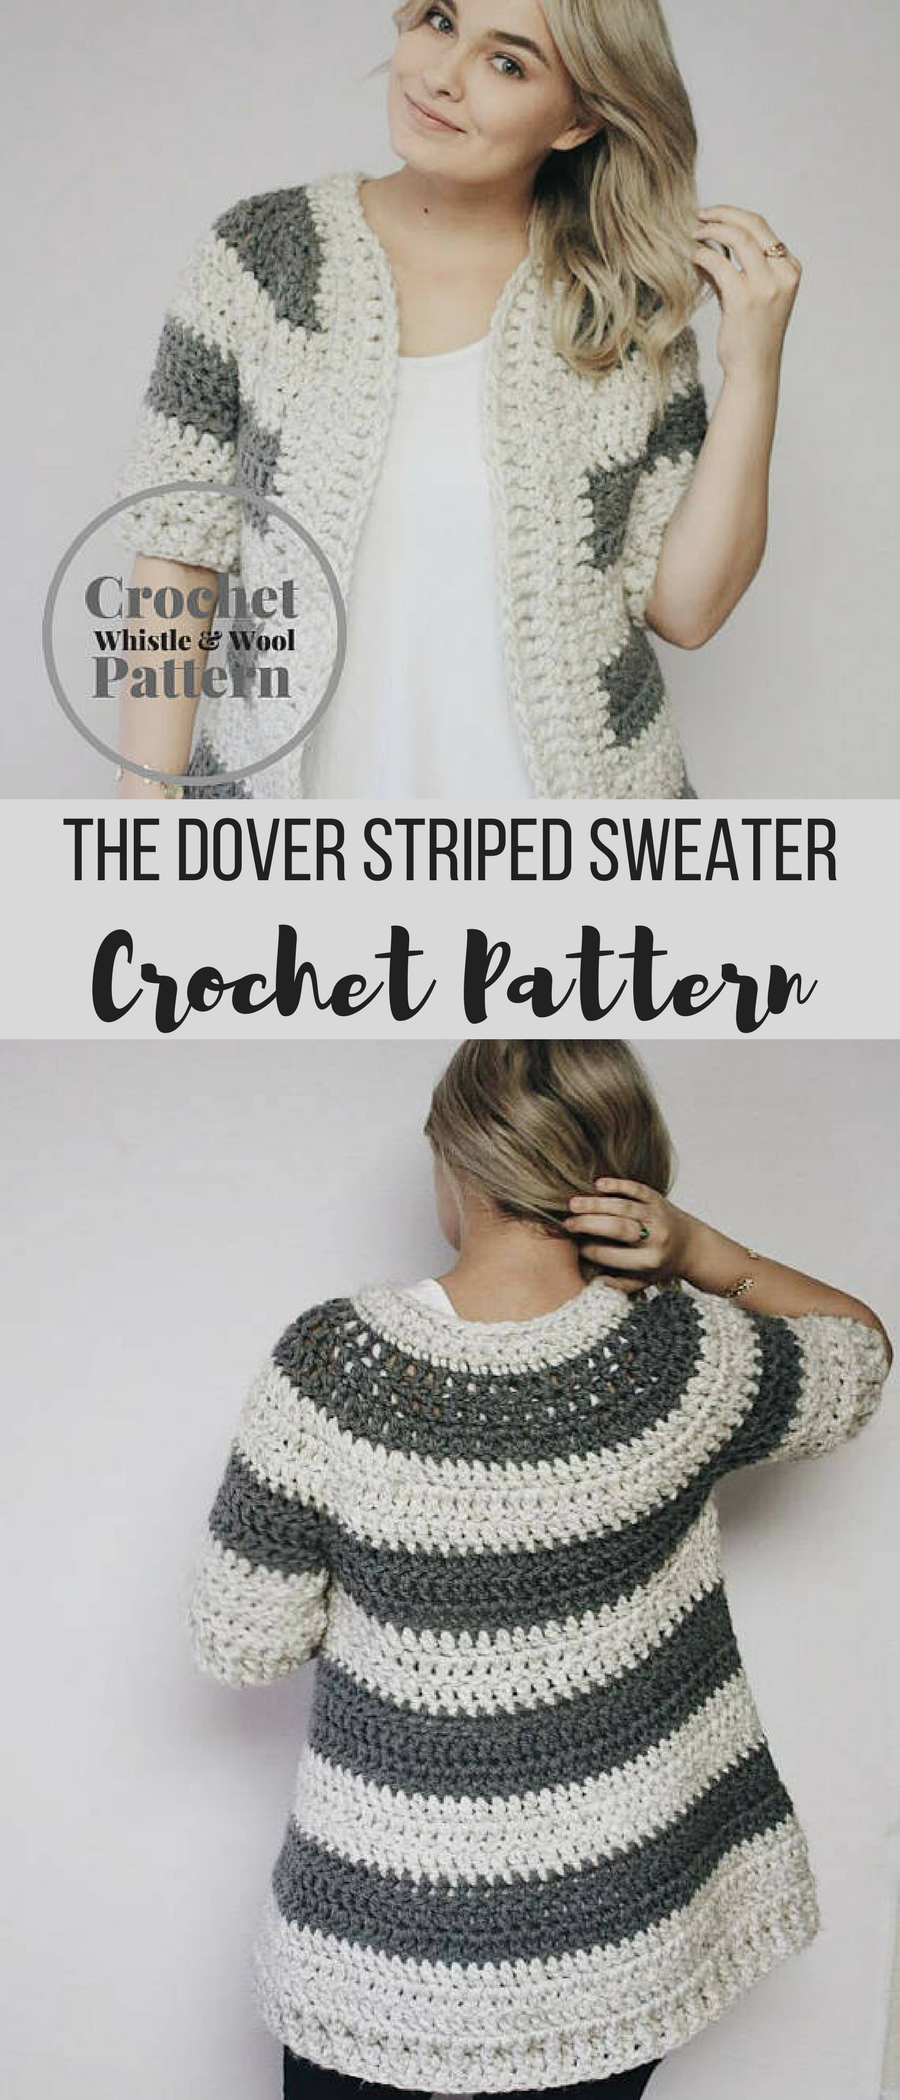 The Dover Striped Women\'s Cardigan Sweater Crochet Pattern ...